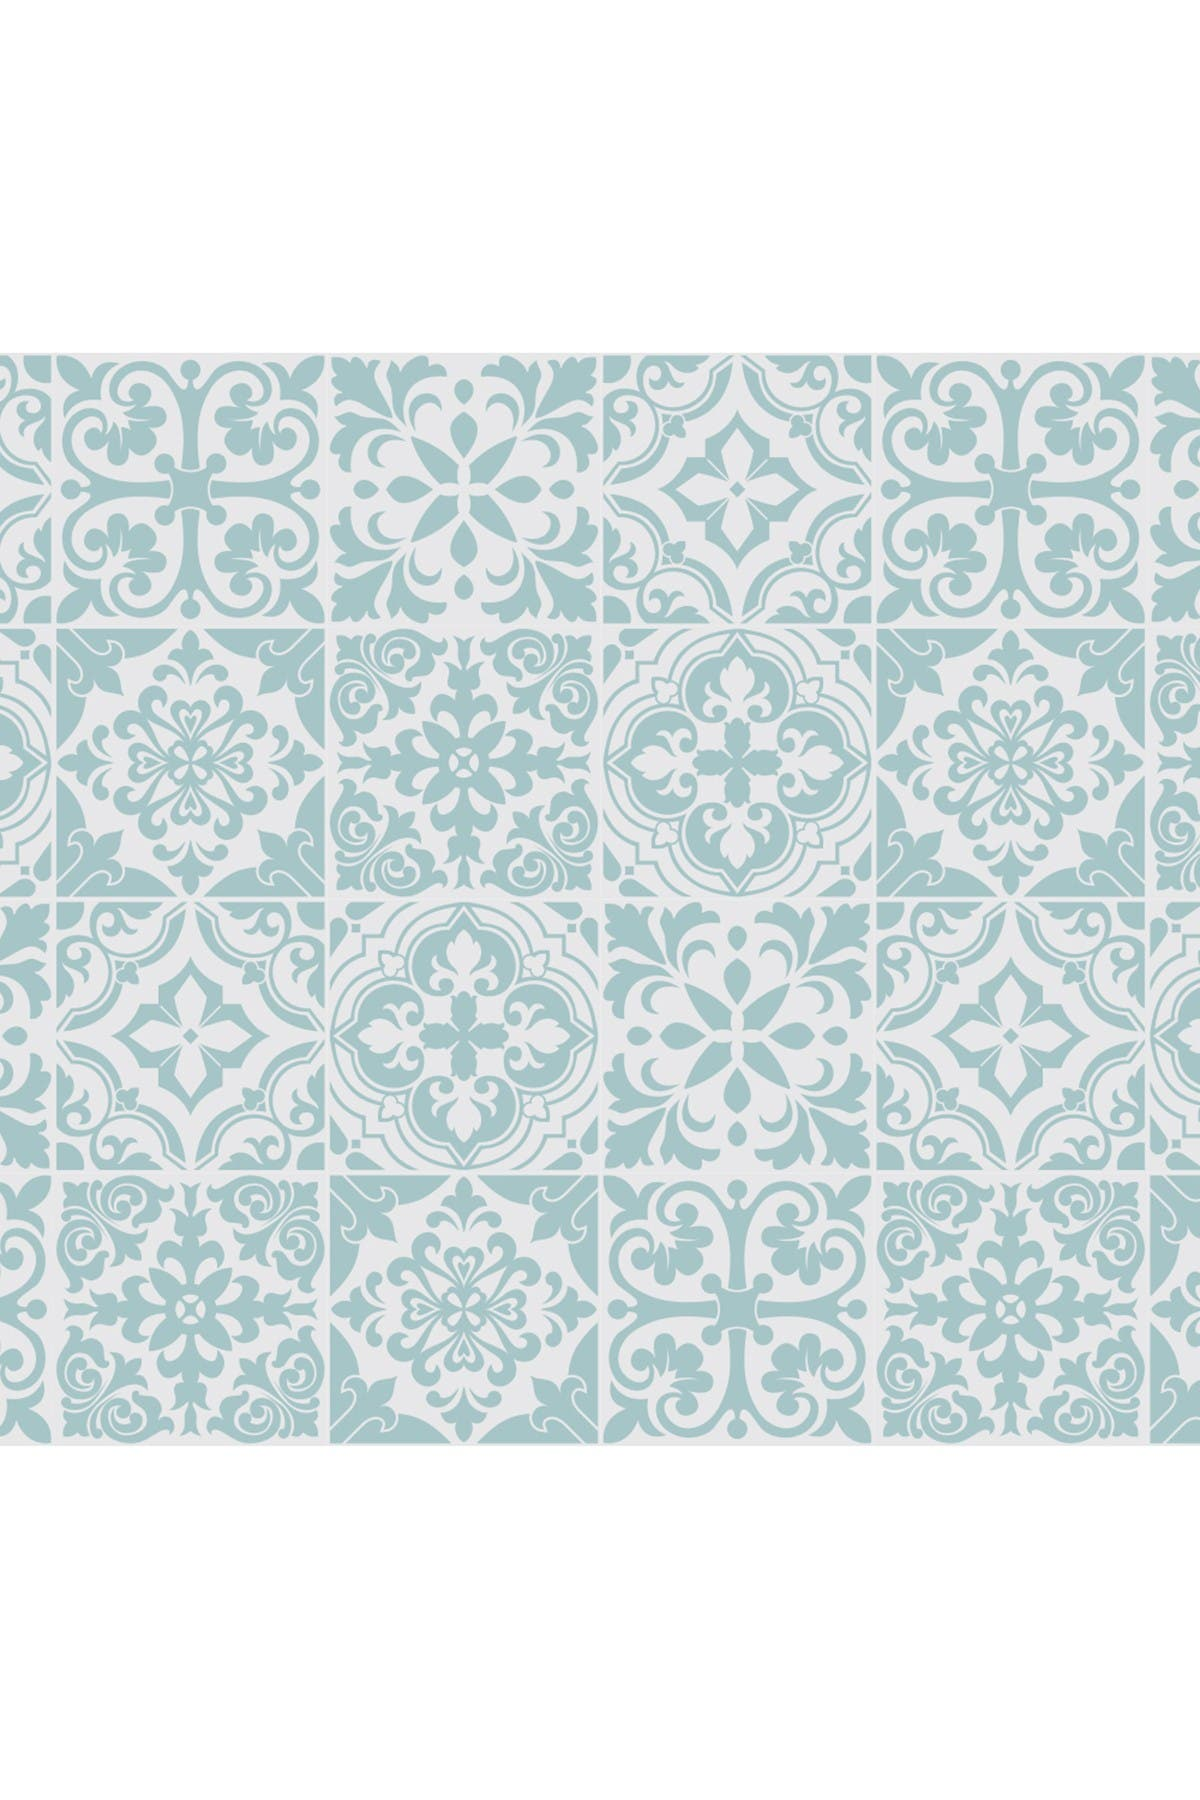 Image of WalPlus Santa Rosa Pistachio - Light Grey Stencil Tiles Wall Stickers - 6 x 6 inches - 24 Pieces